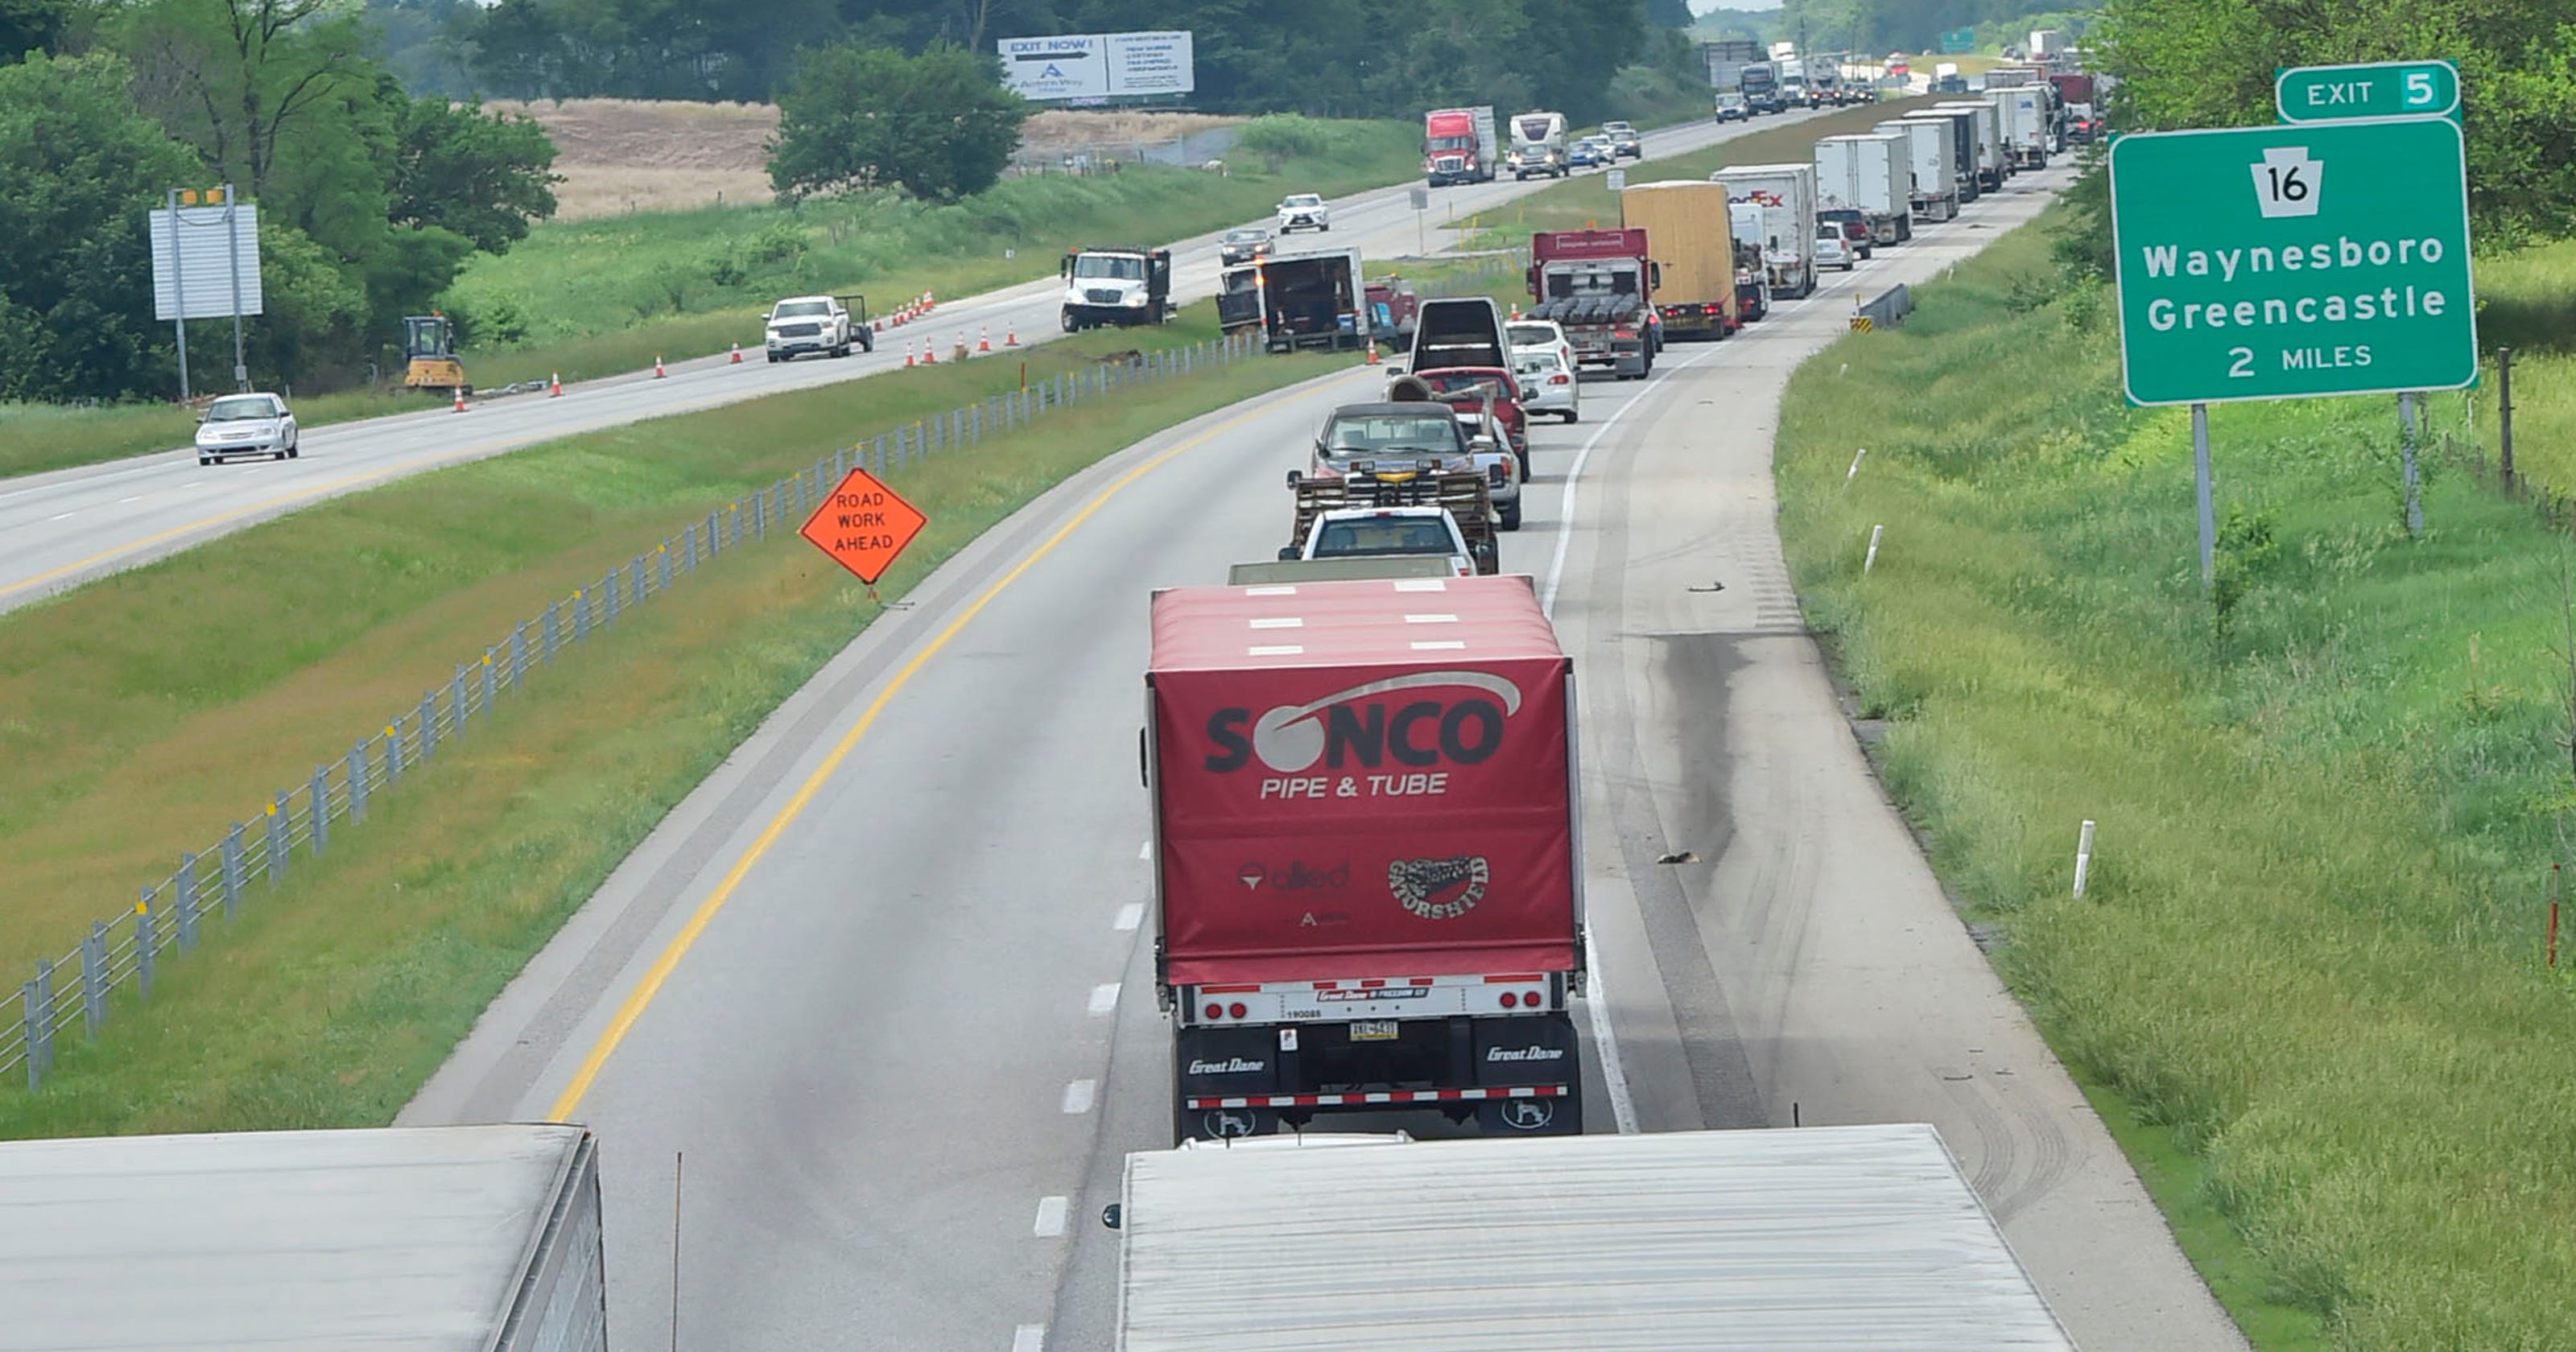 I-81 Traffic Pa Related Keywords & Suggestions - I-81 Traffic Pa